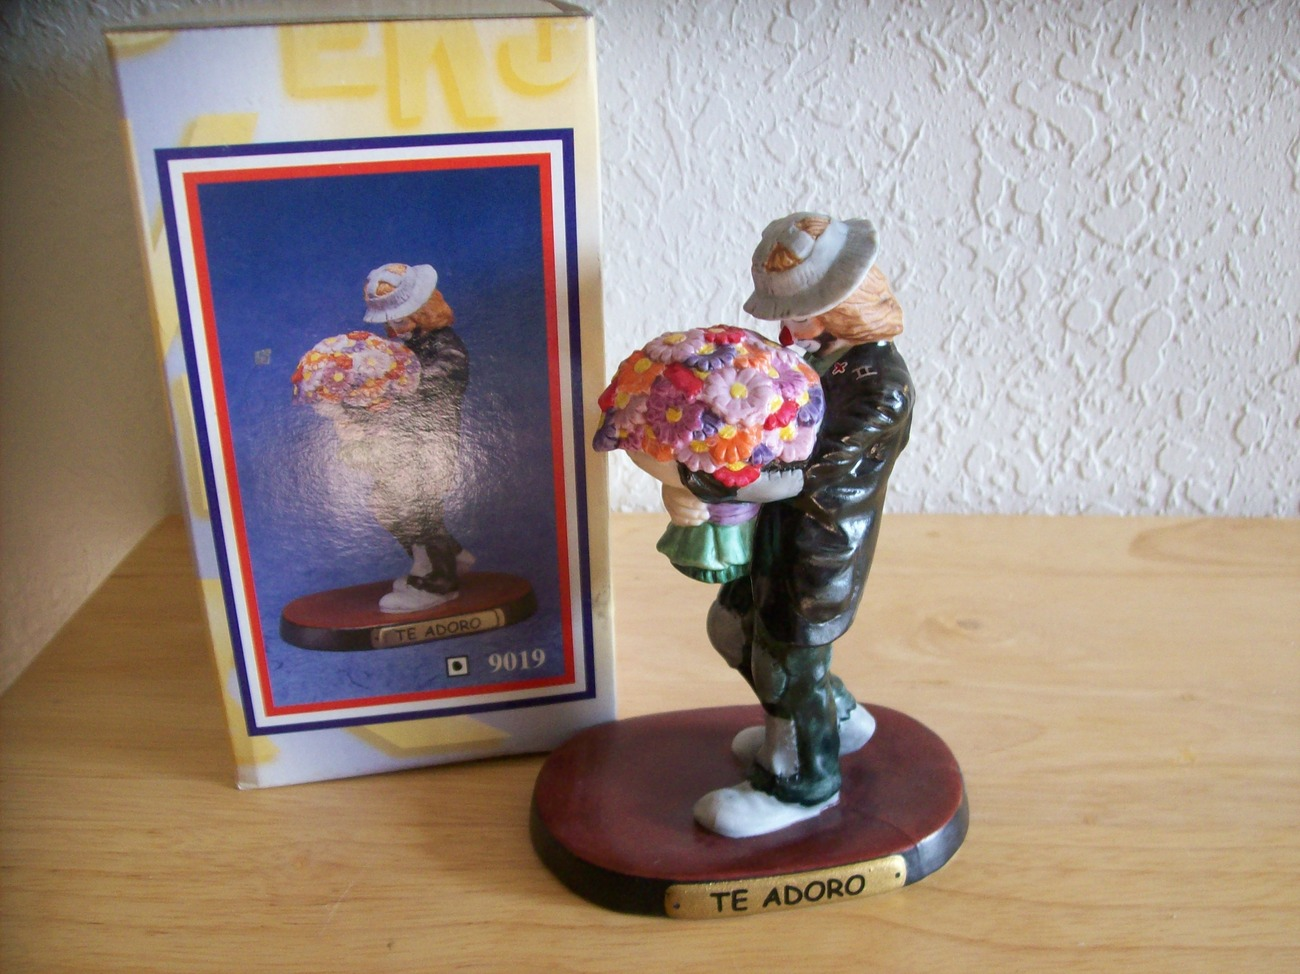 "1998 Emmett Kelly JR. ""Te Adoro"" Figurine (9019)"